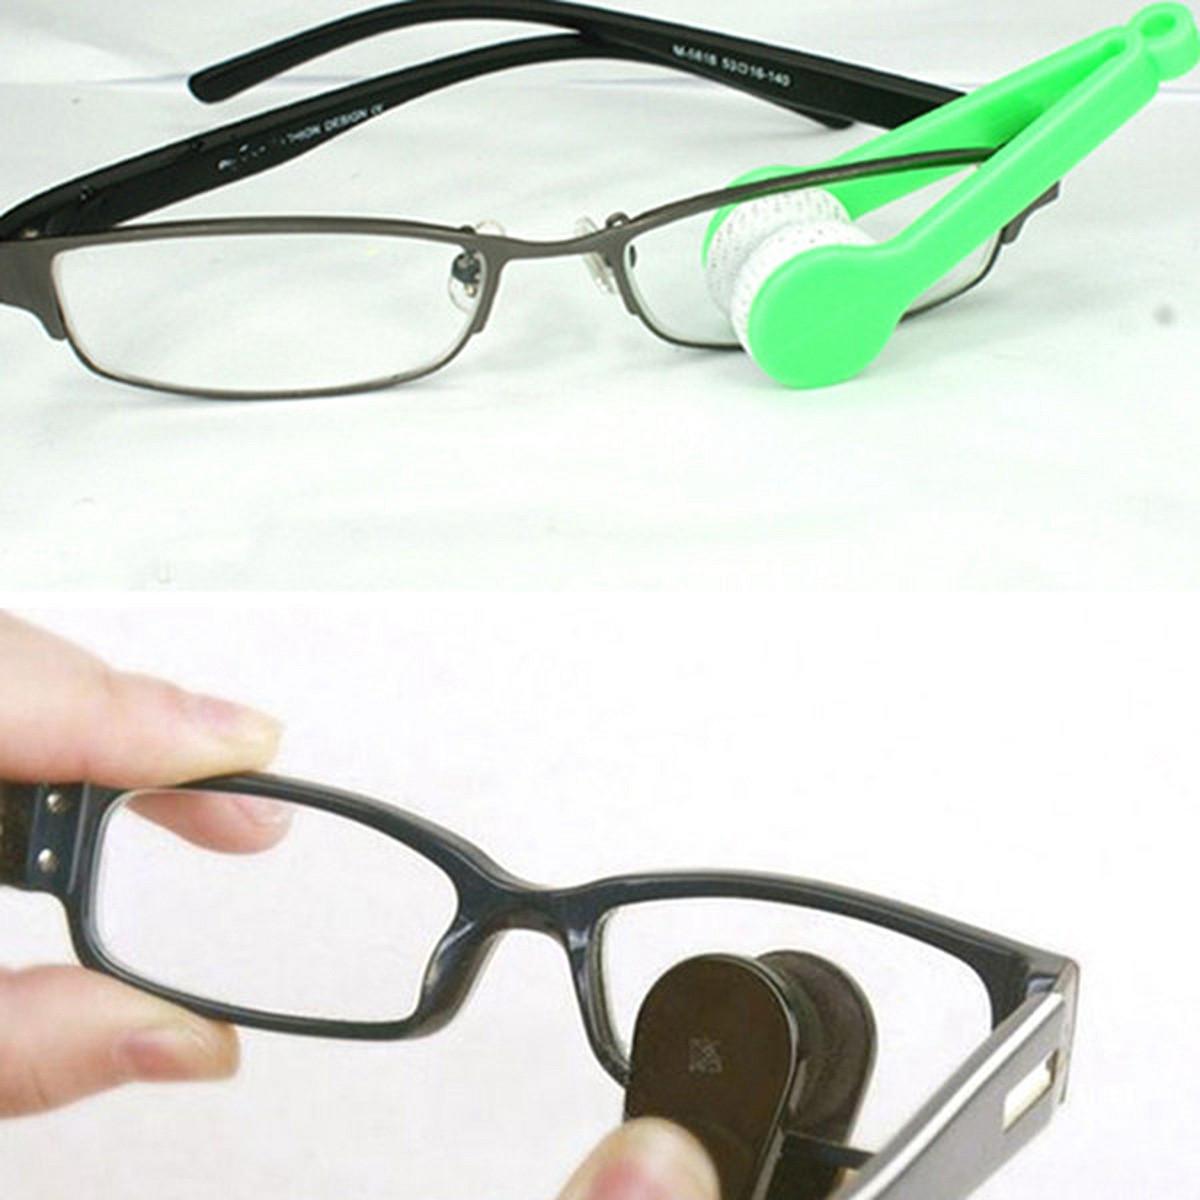 3x Micro-Fibre Glasses Lens Cleaner Eyeglasses Clean Sun ...